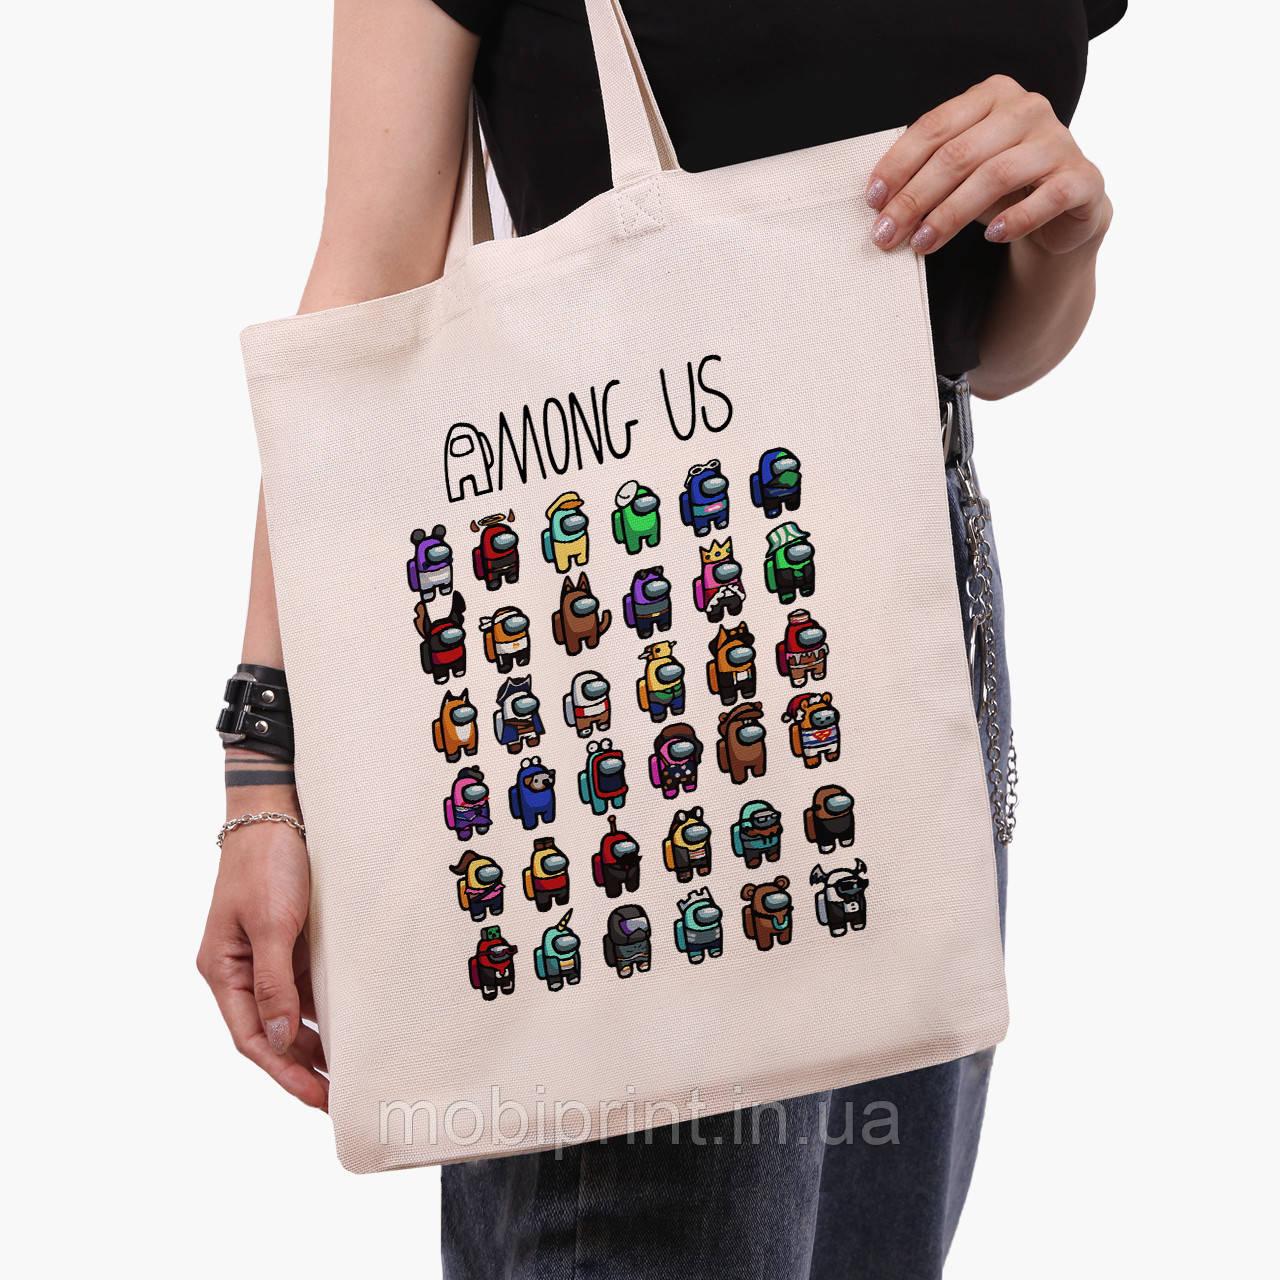 Эко сумка шоппер Амонг Ас (Among Us) (9227-2587)  41*35 см